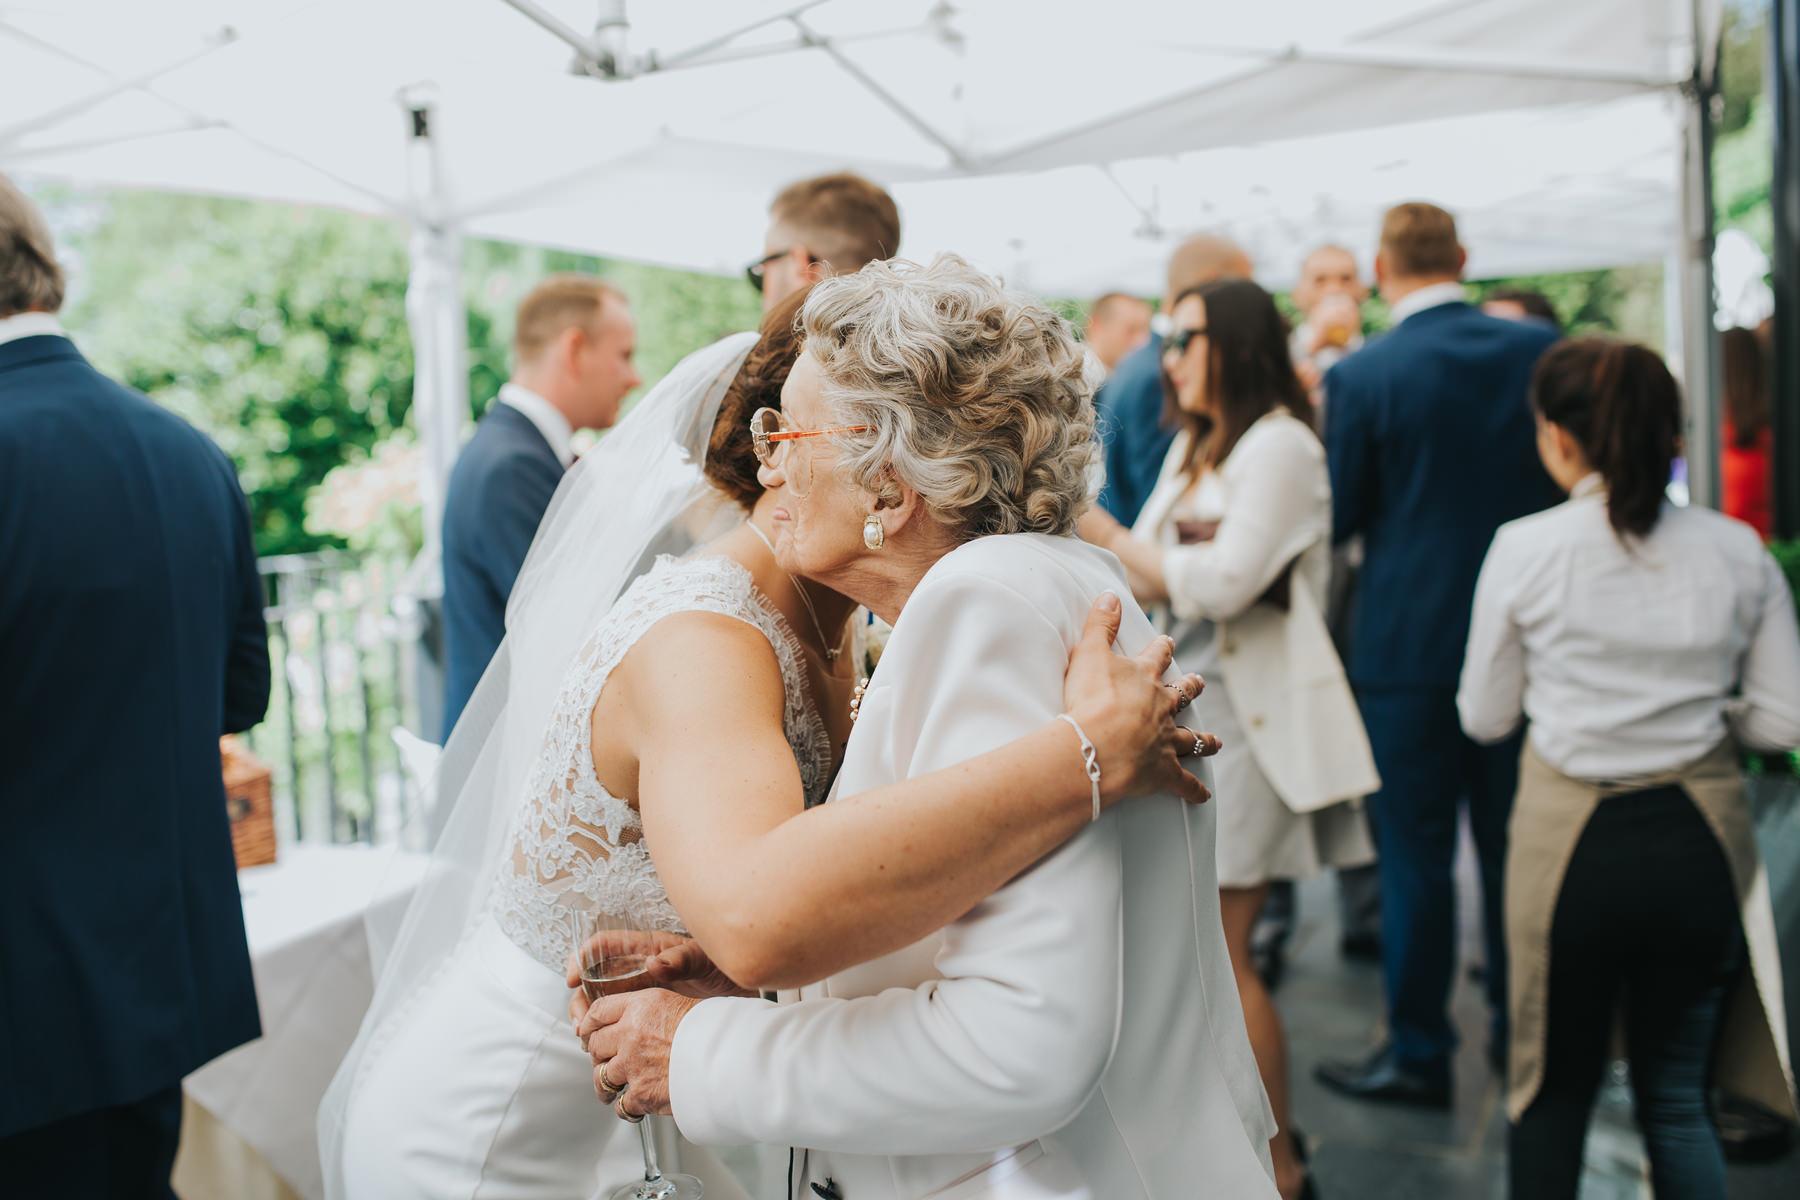 CRL-288-The Bingham wedding Richmond-bride grandmother embrace.jpg